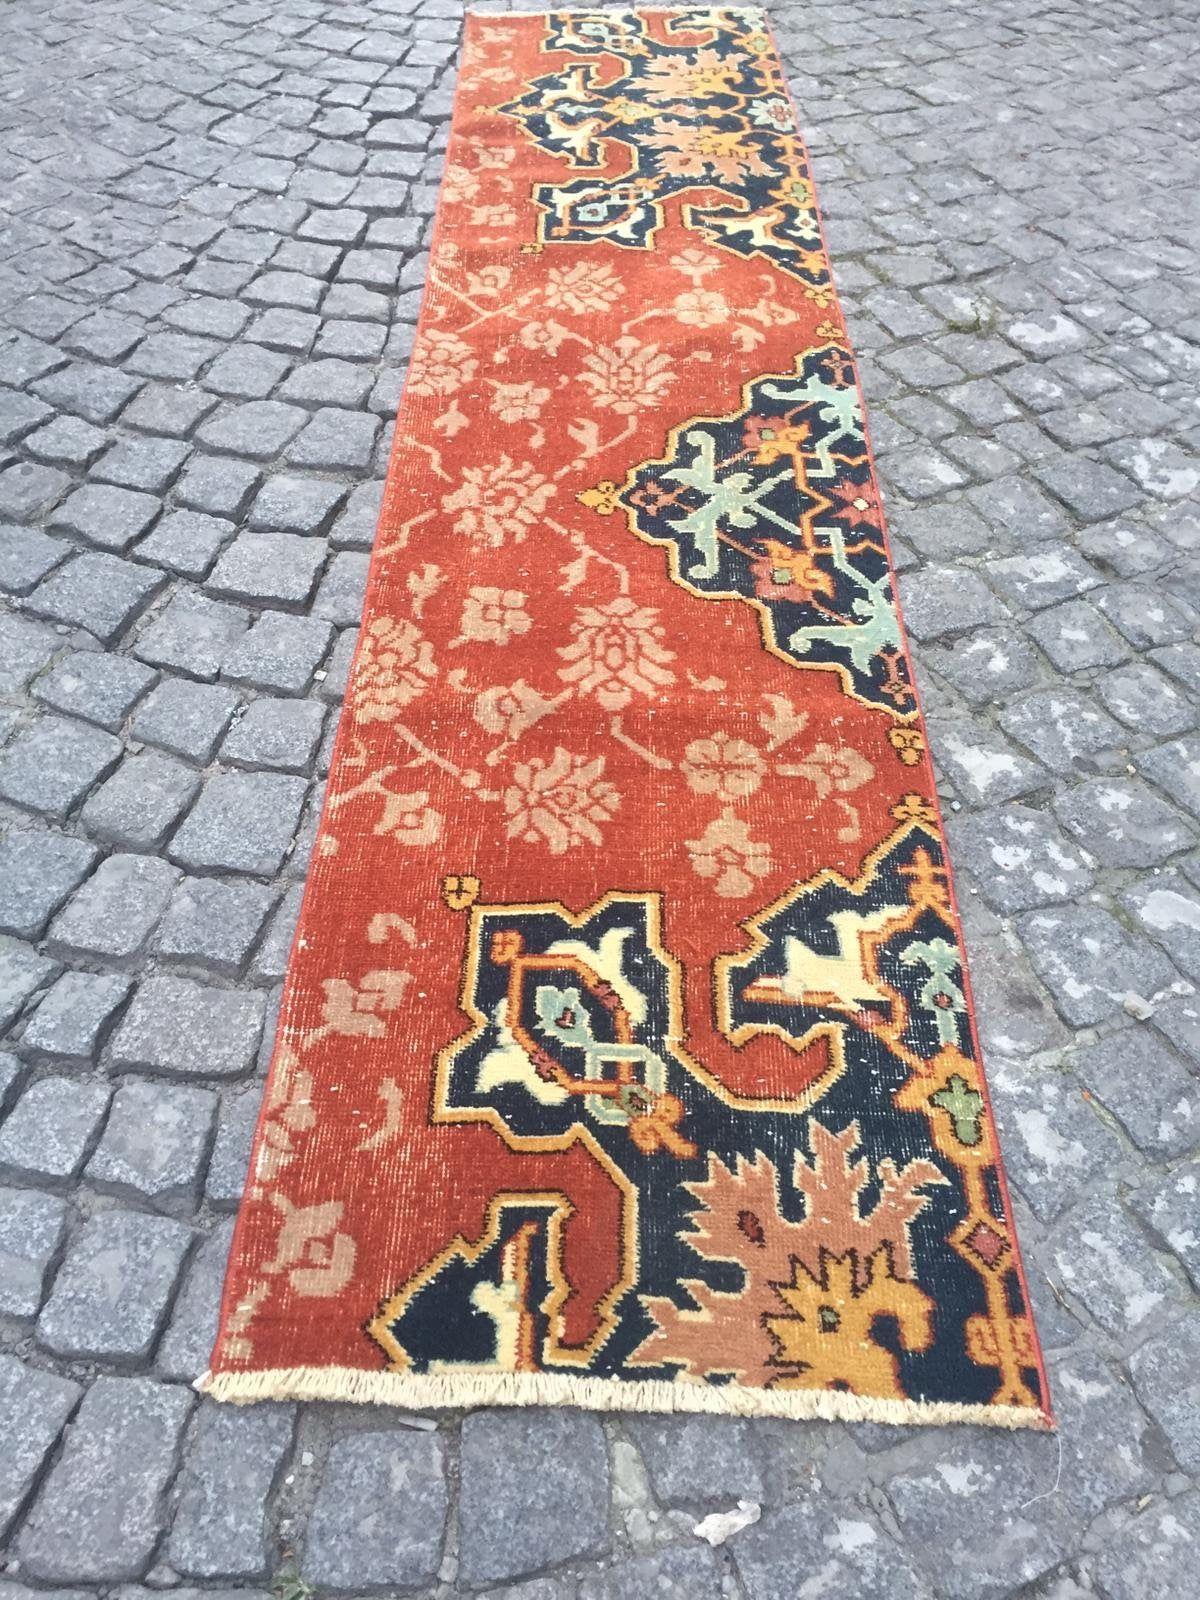 Turkish Carpet, 044  8'5  Ft x 1'10 Ft. 2.57cm x 0.57cm Vintage handmade Low pile Tribal Carpet  Anatolia Home Decor. Konya Rug. #carpet #rug #homedecor #officerunner #runner #oushak #HomeDécor #turkishkilimpillow #bohemianpillow #cushioncover #decorativepillow #pillowcase #bohokilimpillow #turkish #rug #etsyrug #etsy #carpet #homedecor #homedizayn #homedesign #newyork #america #dallas #handmaderug #handmade #ottoman #ottomanrug #ruglove #kilimmodelleri #vintage #vintagestyle #oushakrug #kilim